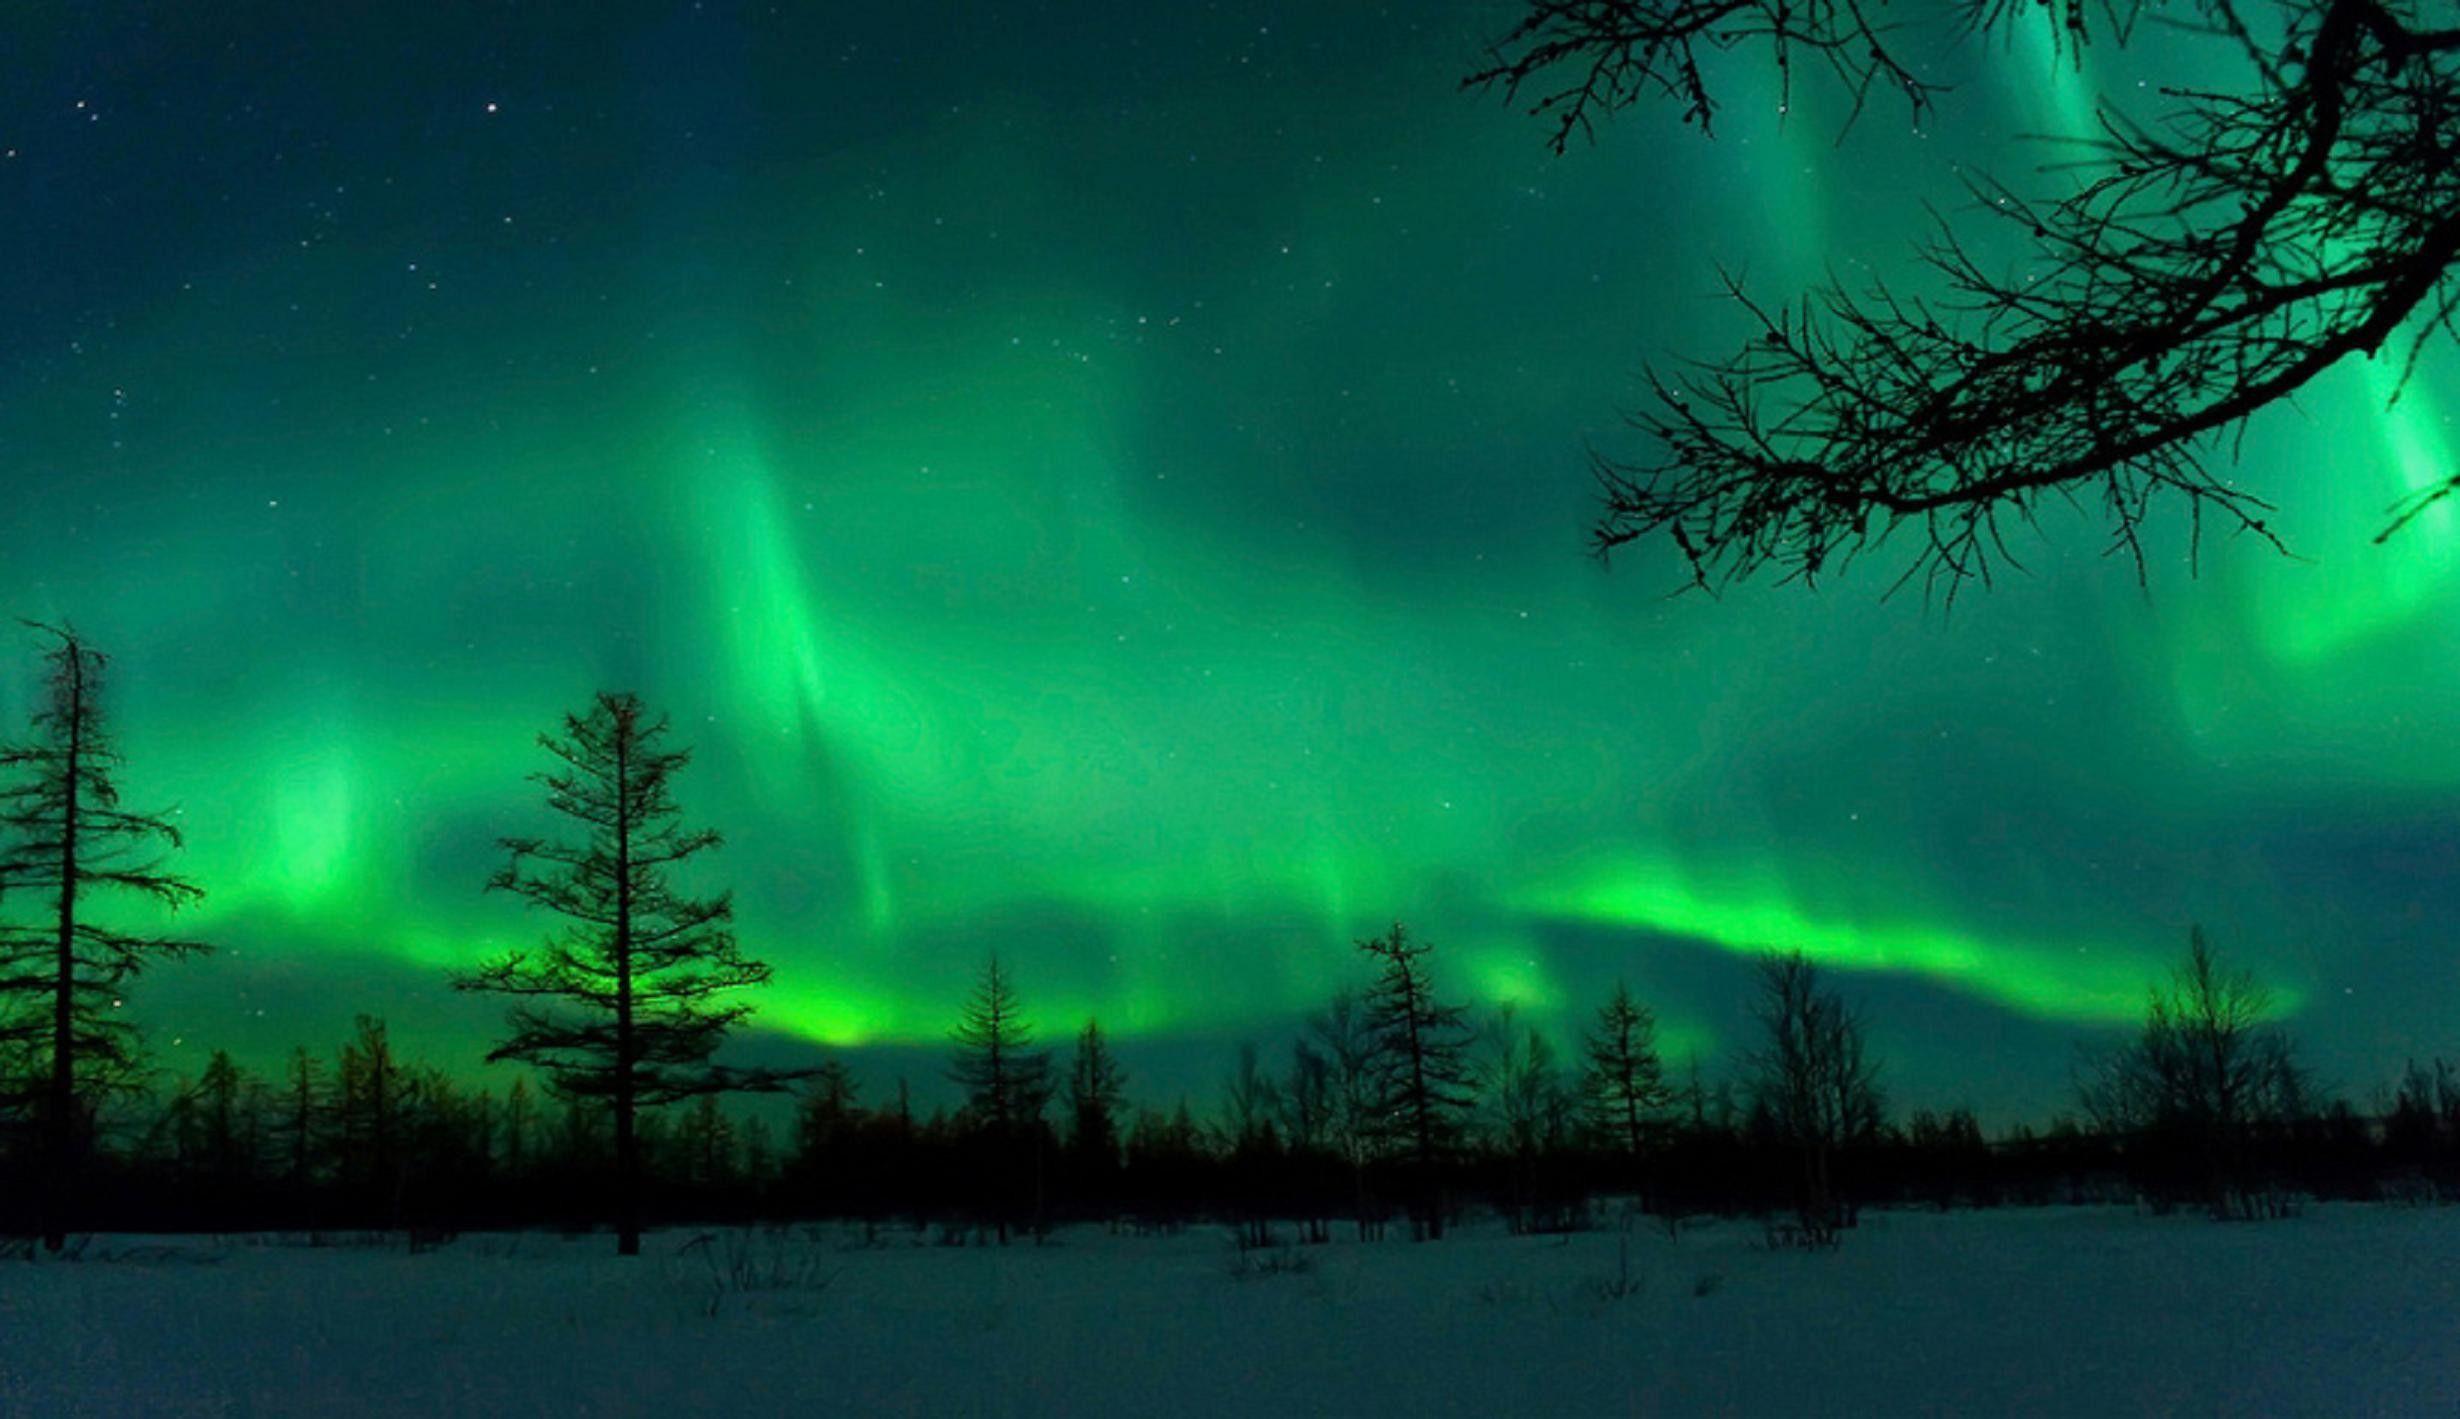 2460x1419 aurora borealis wallpapers hd wallpaper | nacht